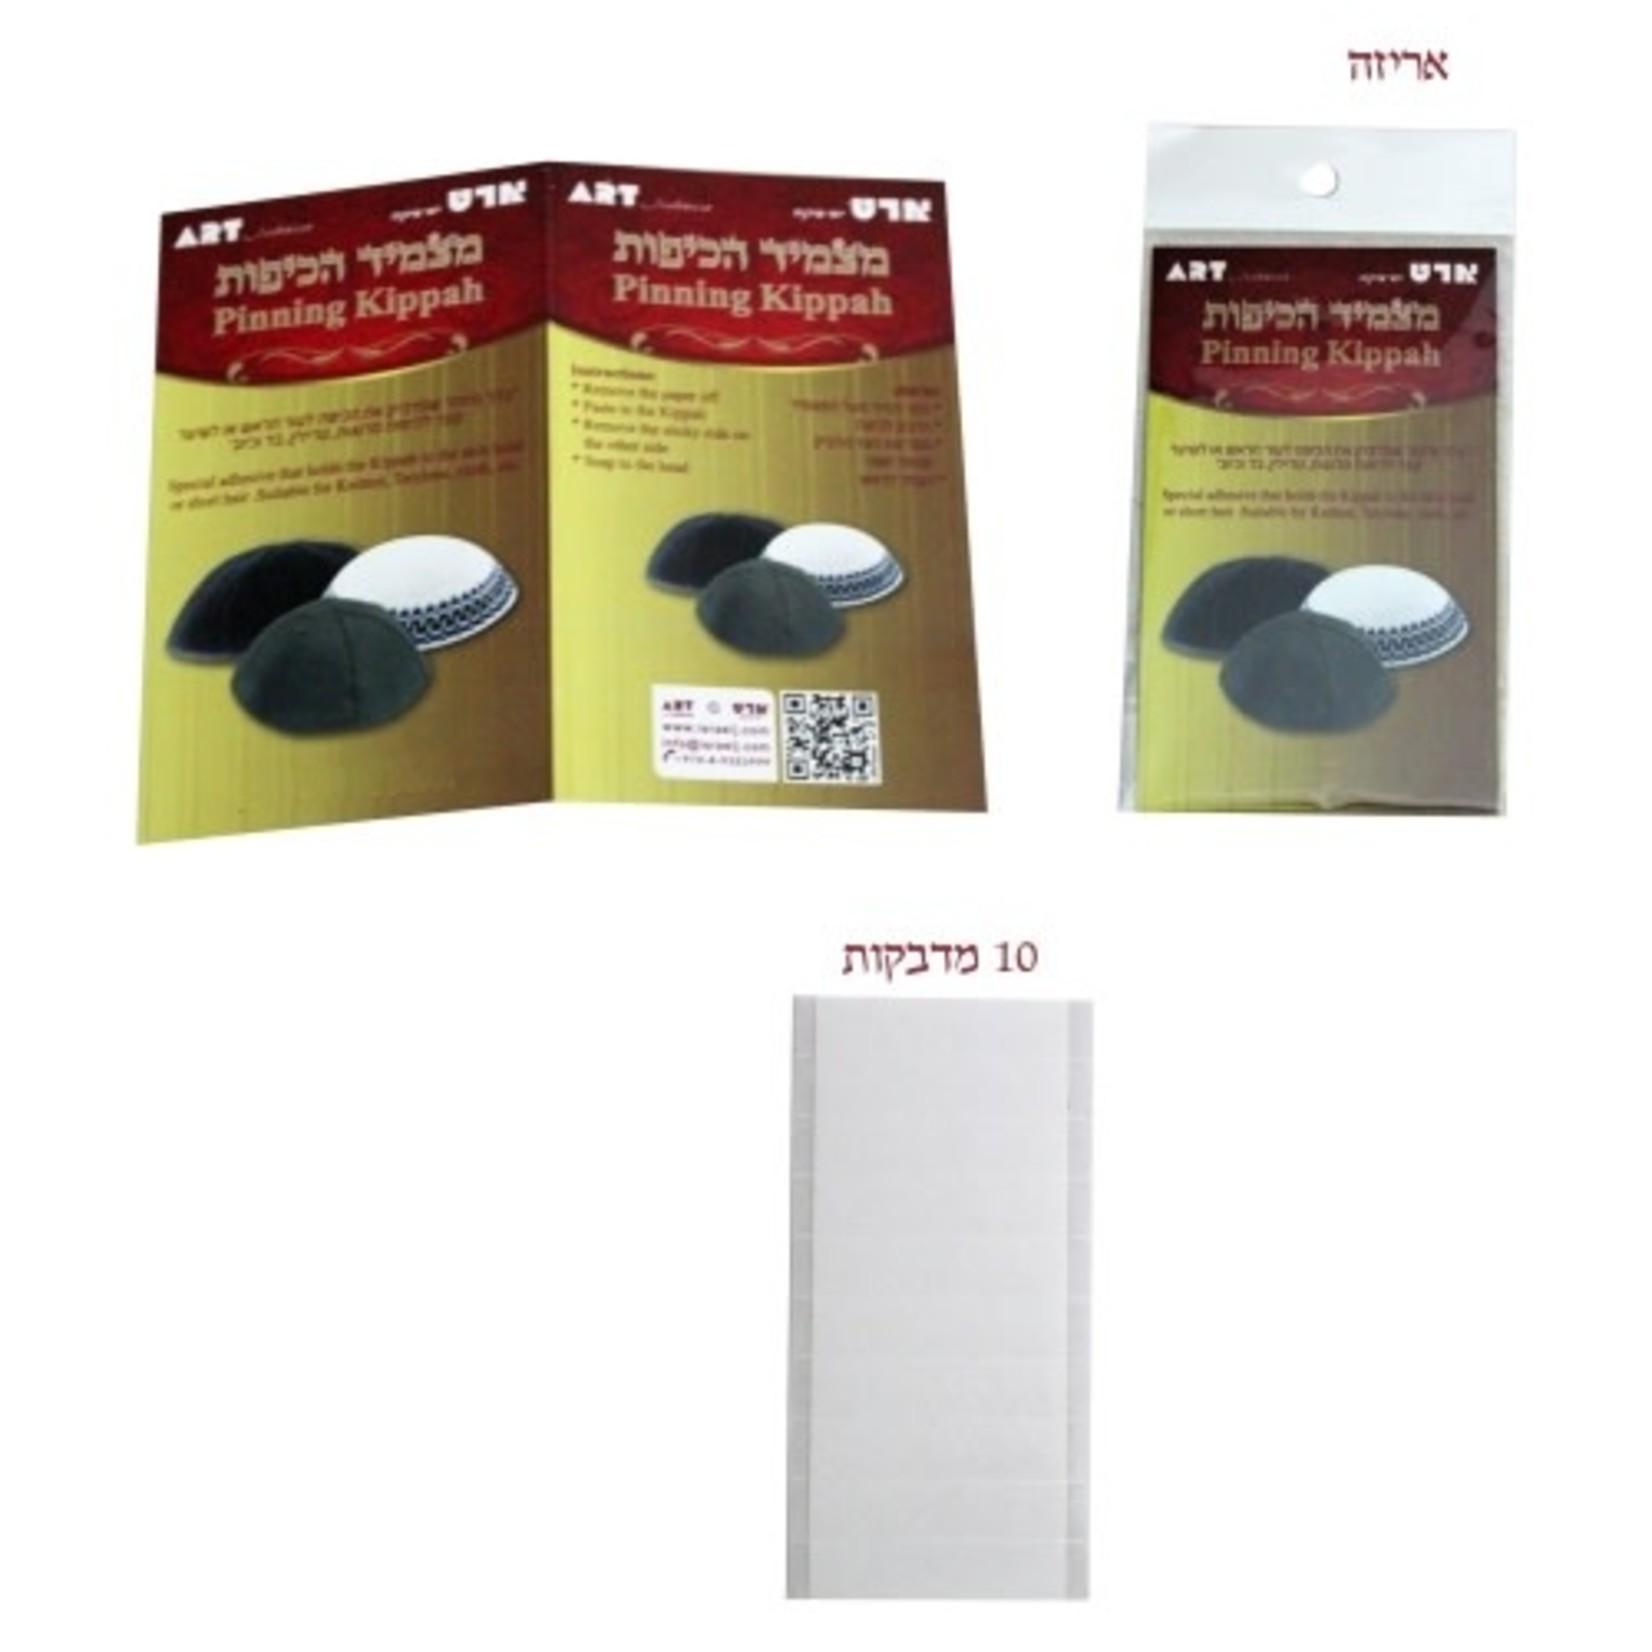 Kippah Adhesive for Bald Heads, 10-pack